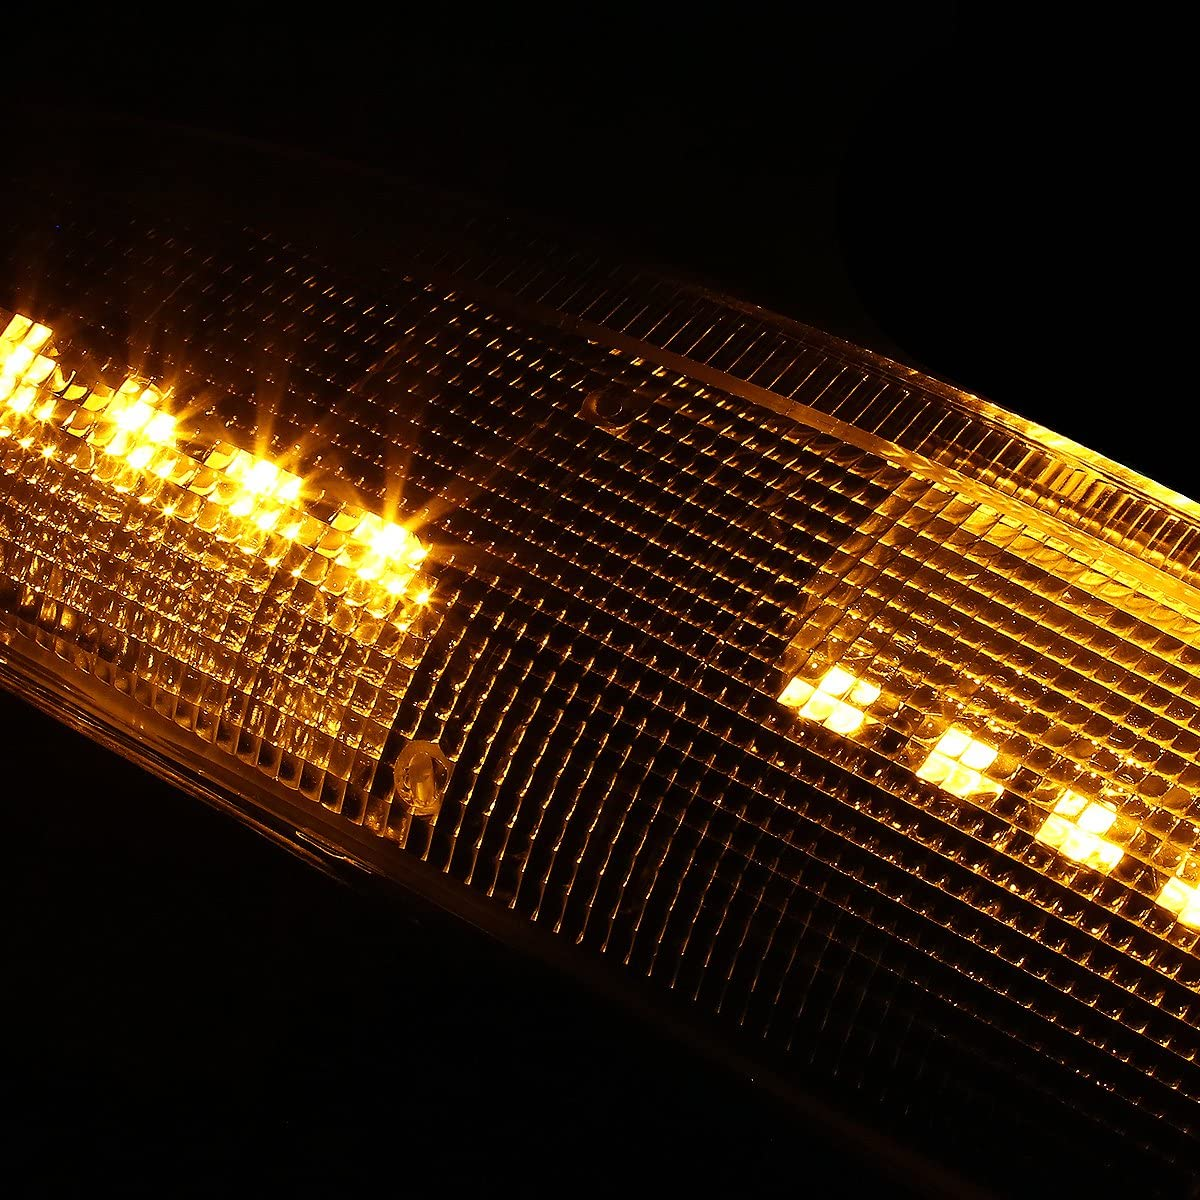 DNA MOTORING MLEDL-003-BK-SM-AM Black Housing Side Mirror Turn Signal Light